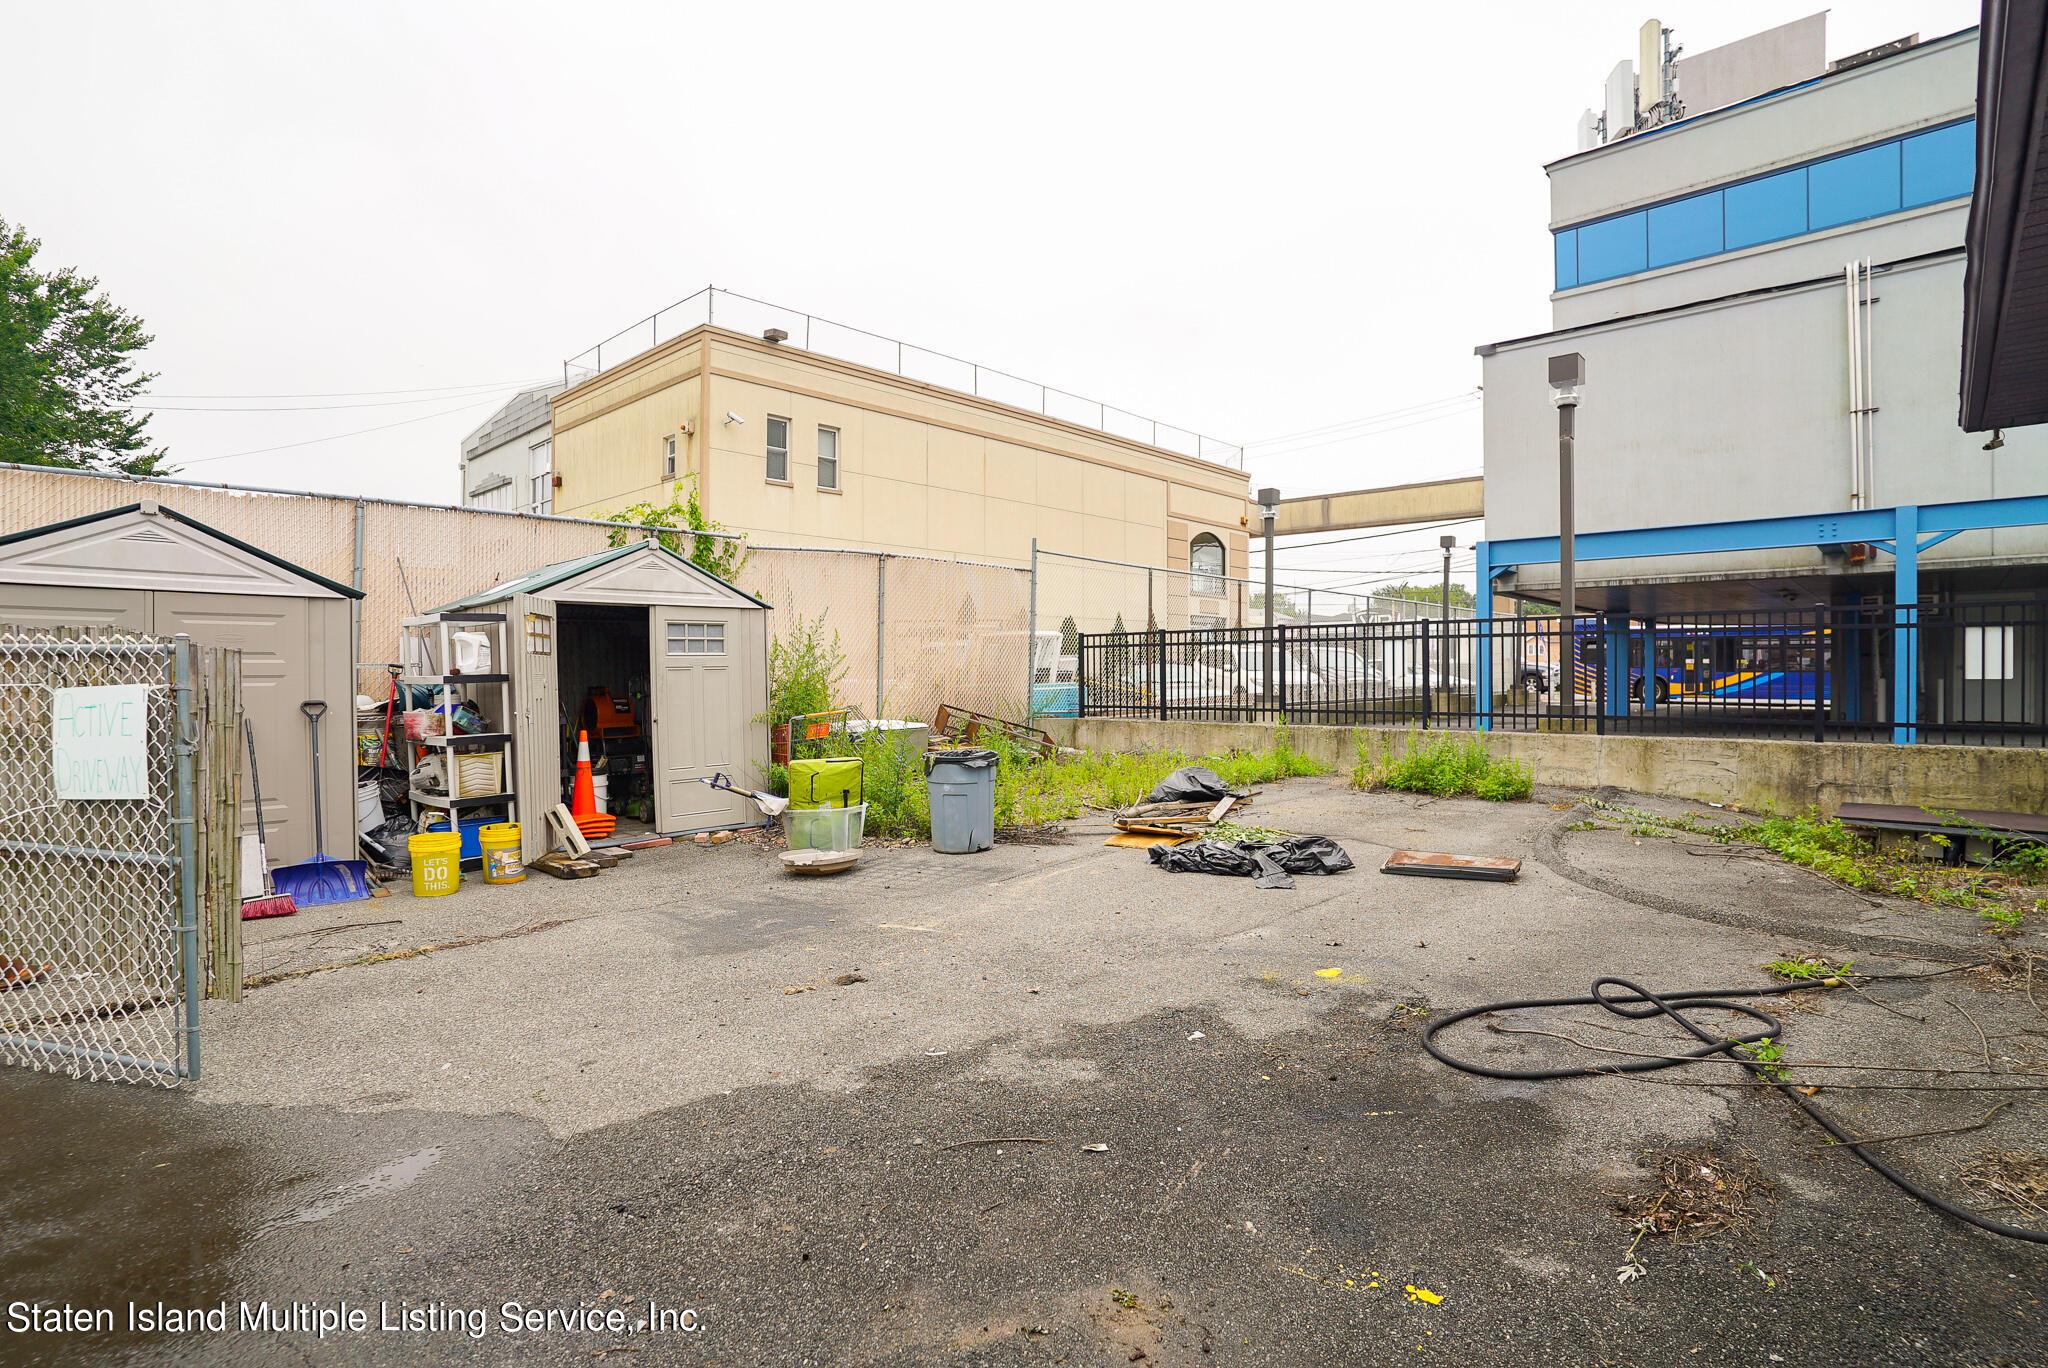 Single Family - Detached 121 Parkinson Avenue  Staten Island, NY 10305, MLS-1147747-26